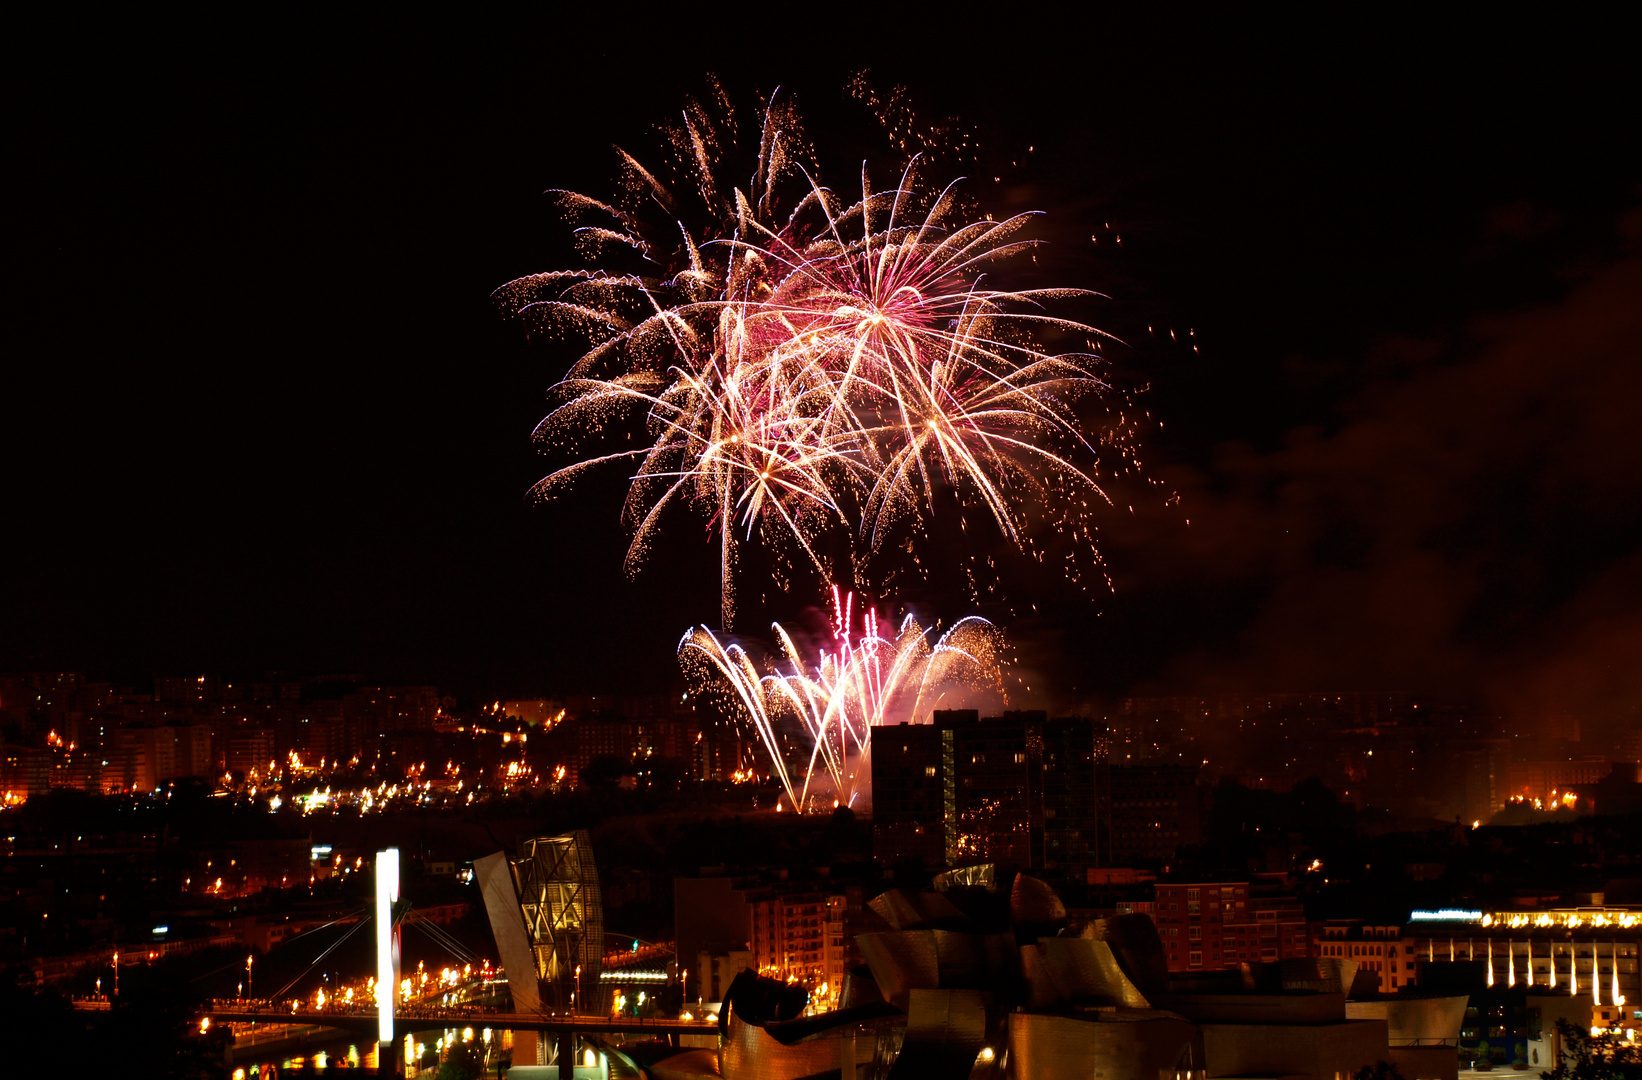 Bilbao fireworks